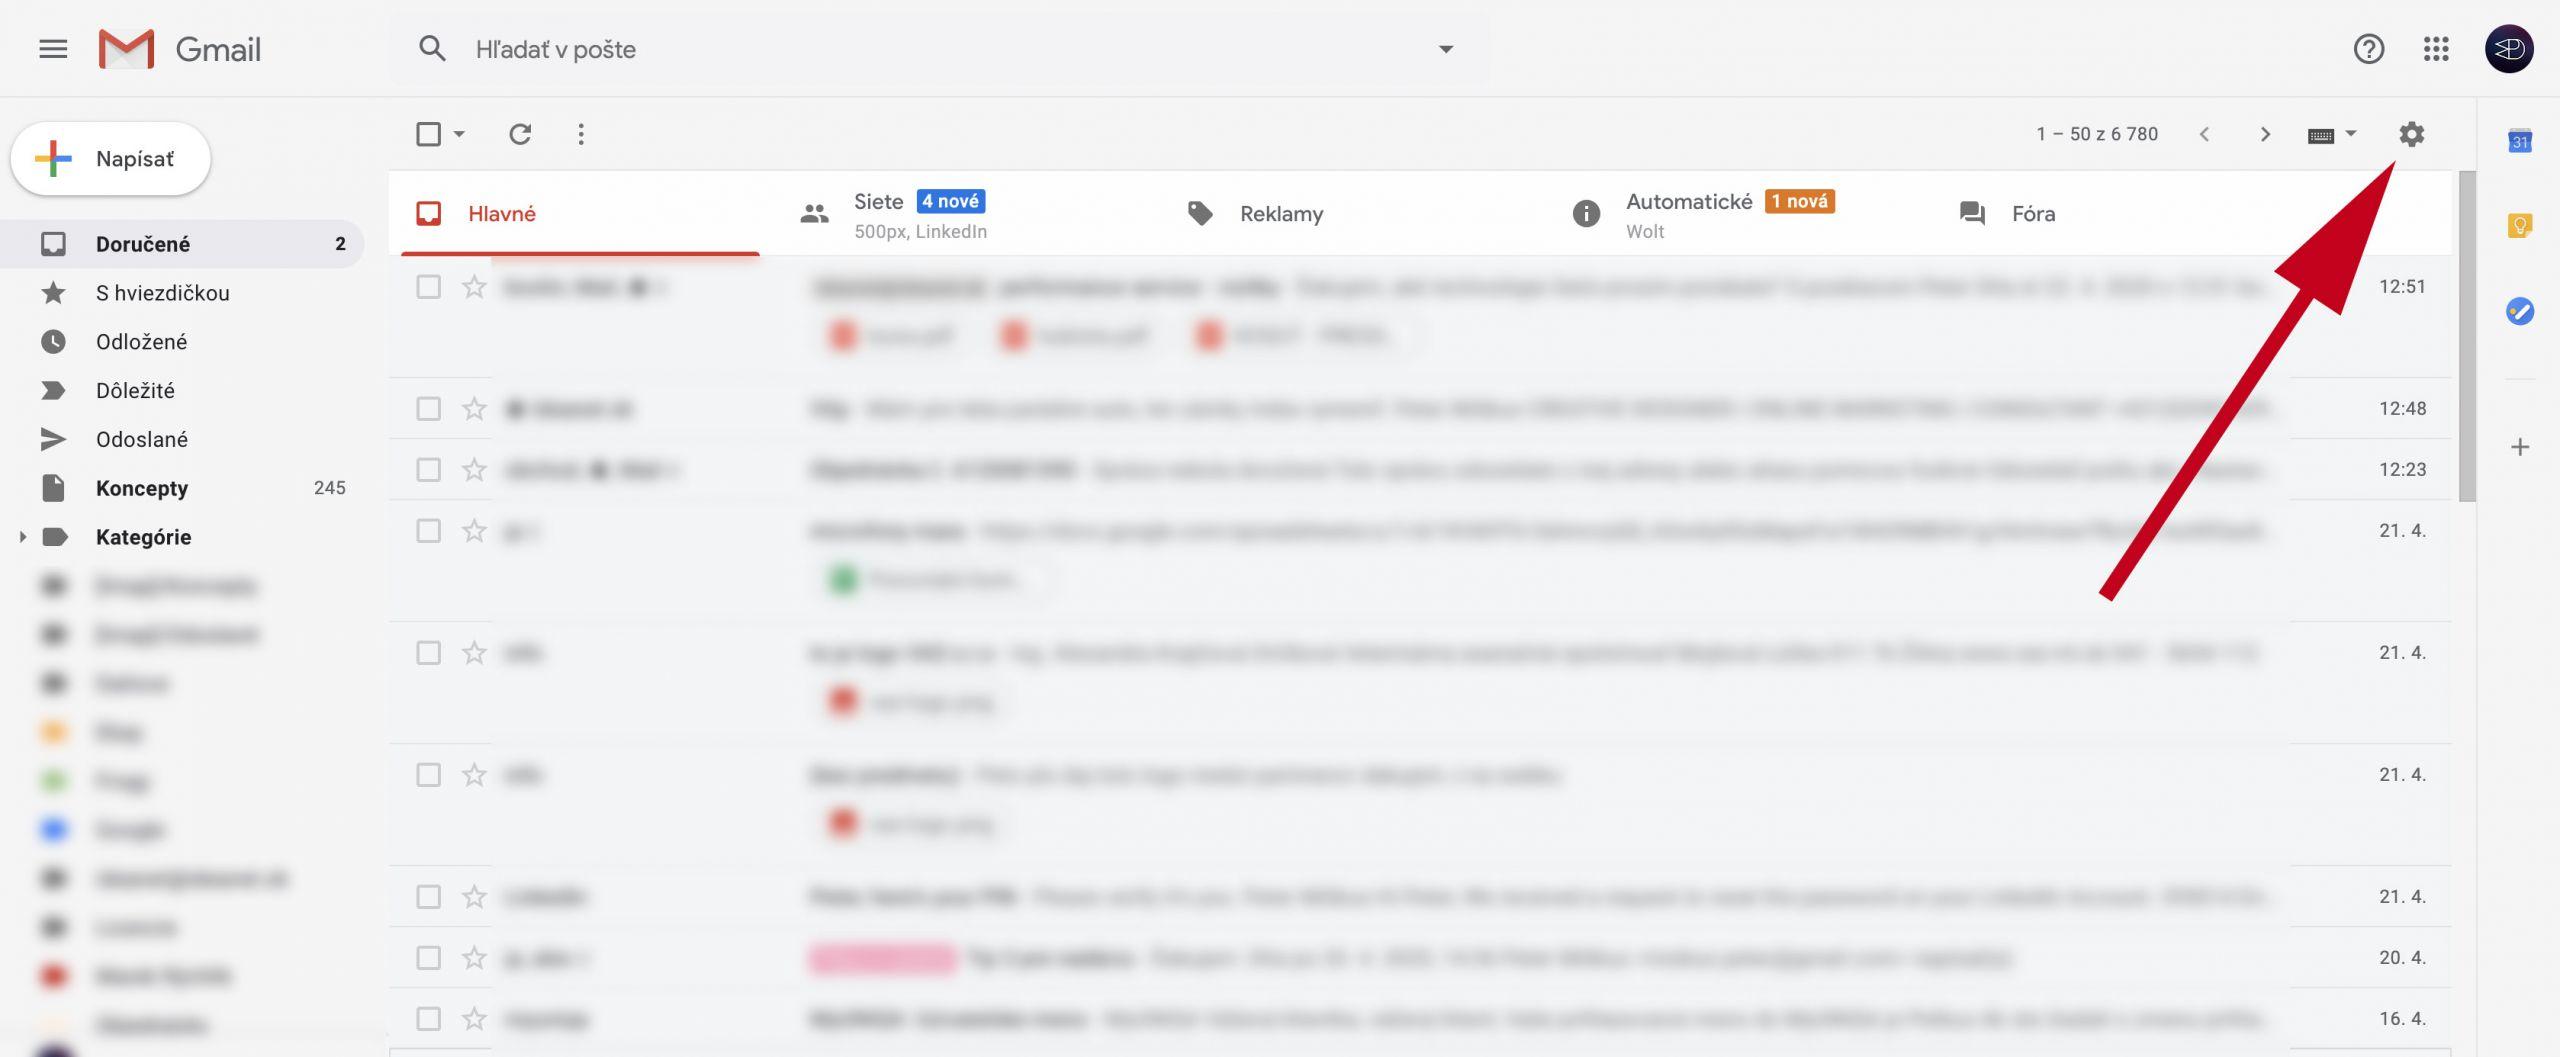 Nefunguje pošta - Gmail oprava